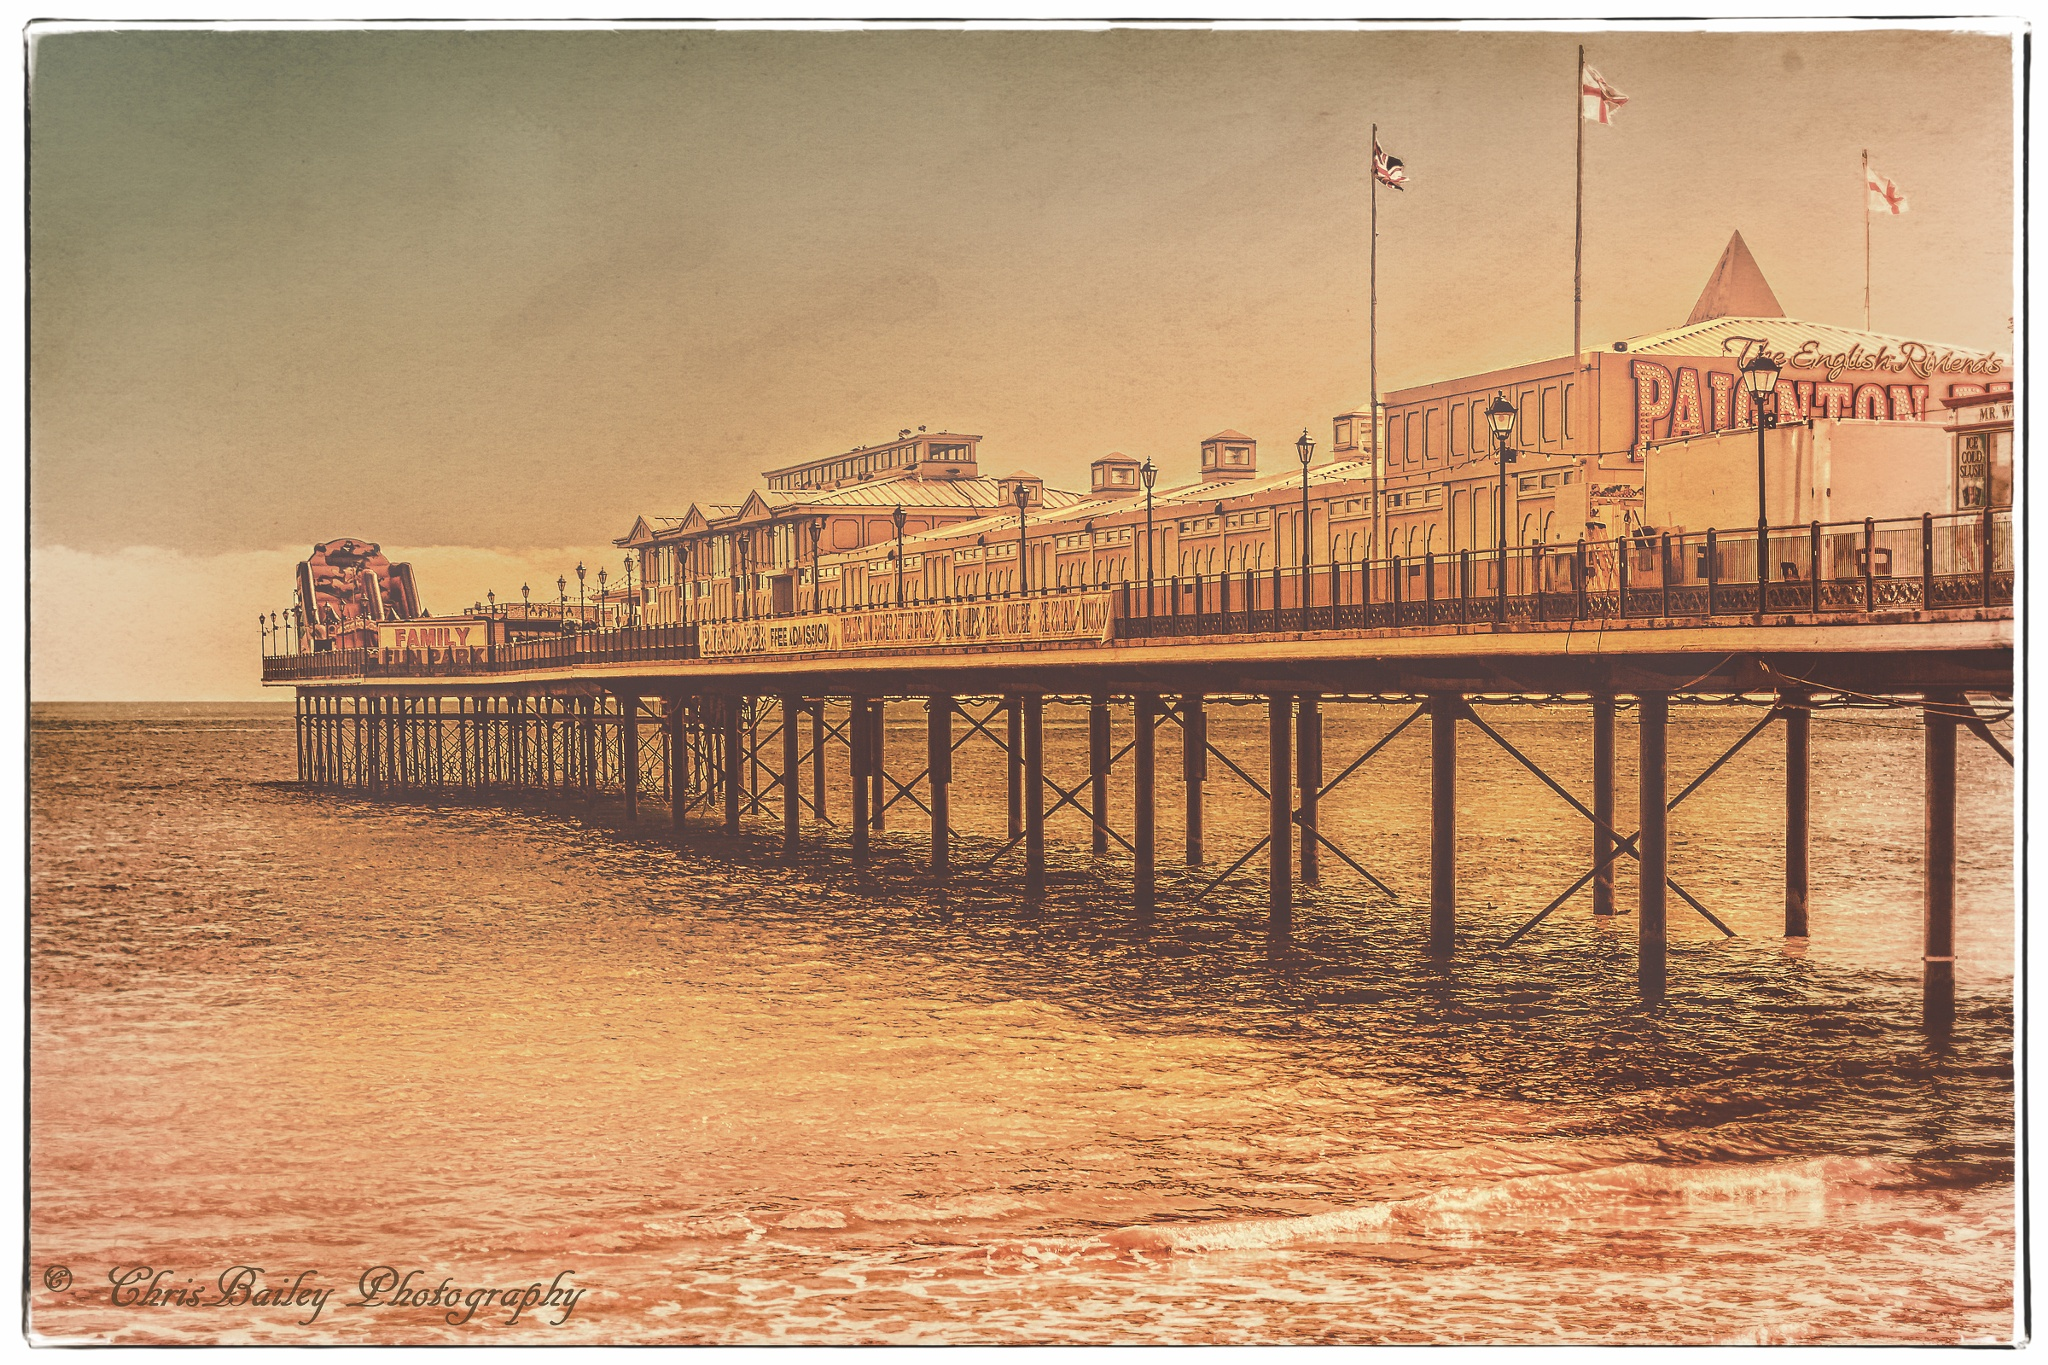 Paignton Pier. 02.4. 20160331 by Chris Bailey